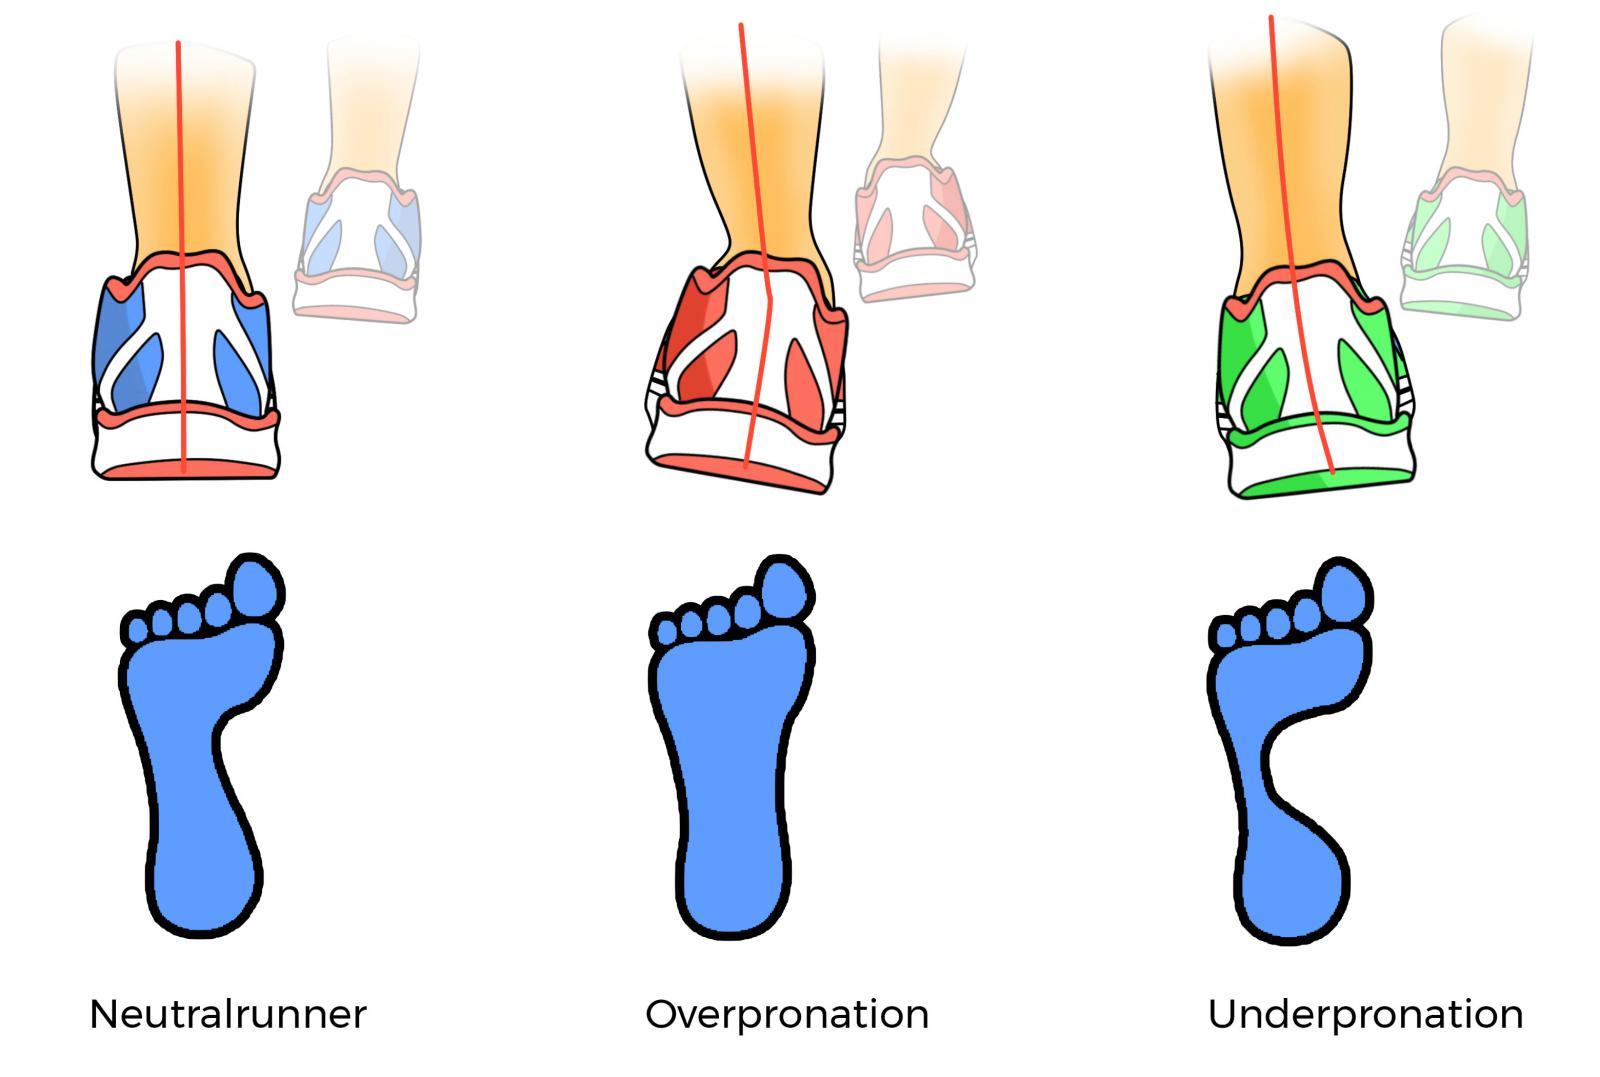 Neutralrunner Overpronation Underpronation